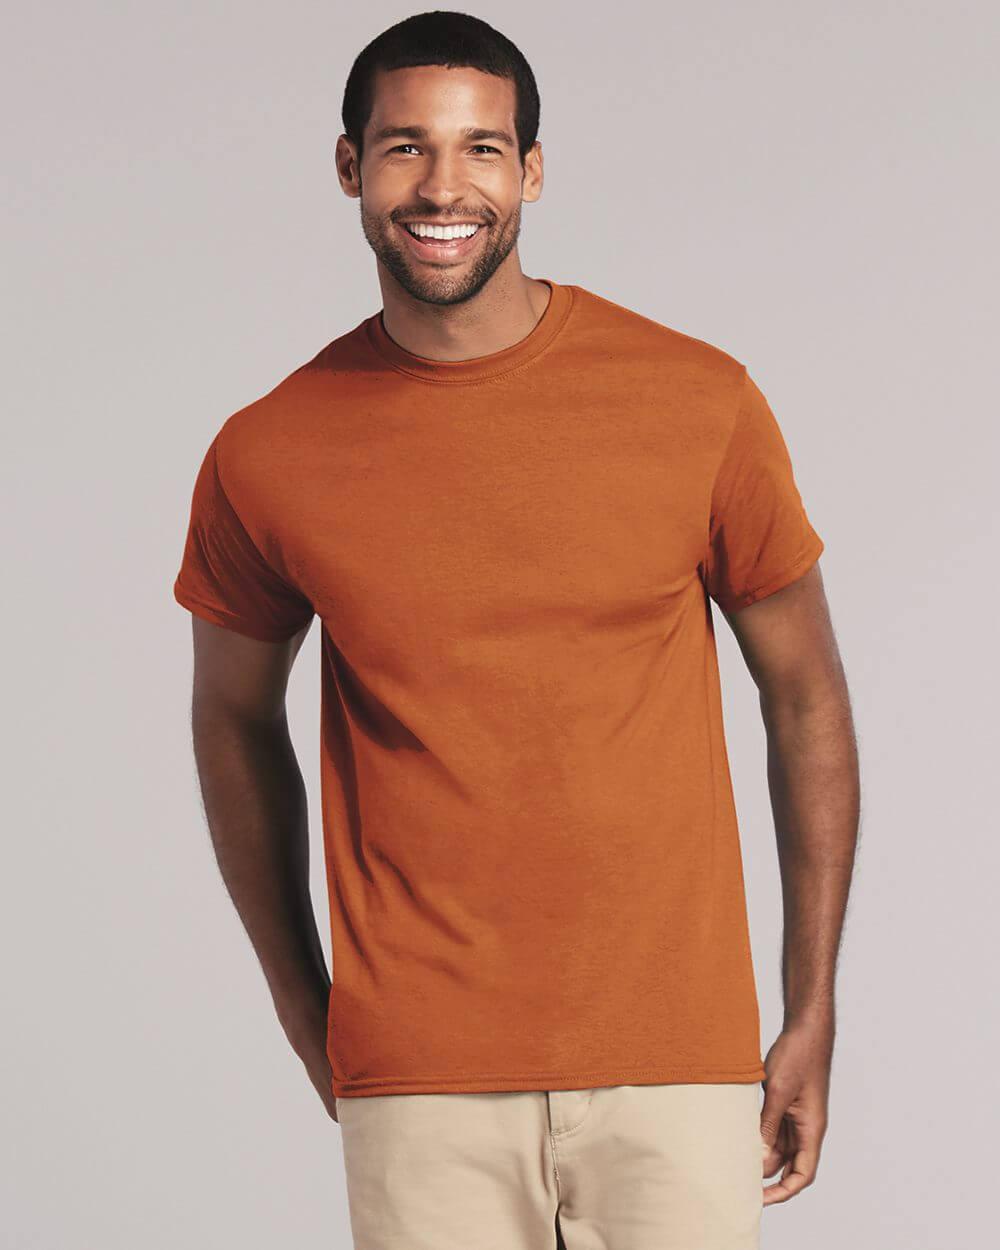 Cheap Custom Printed Shirts